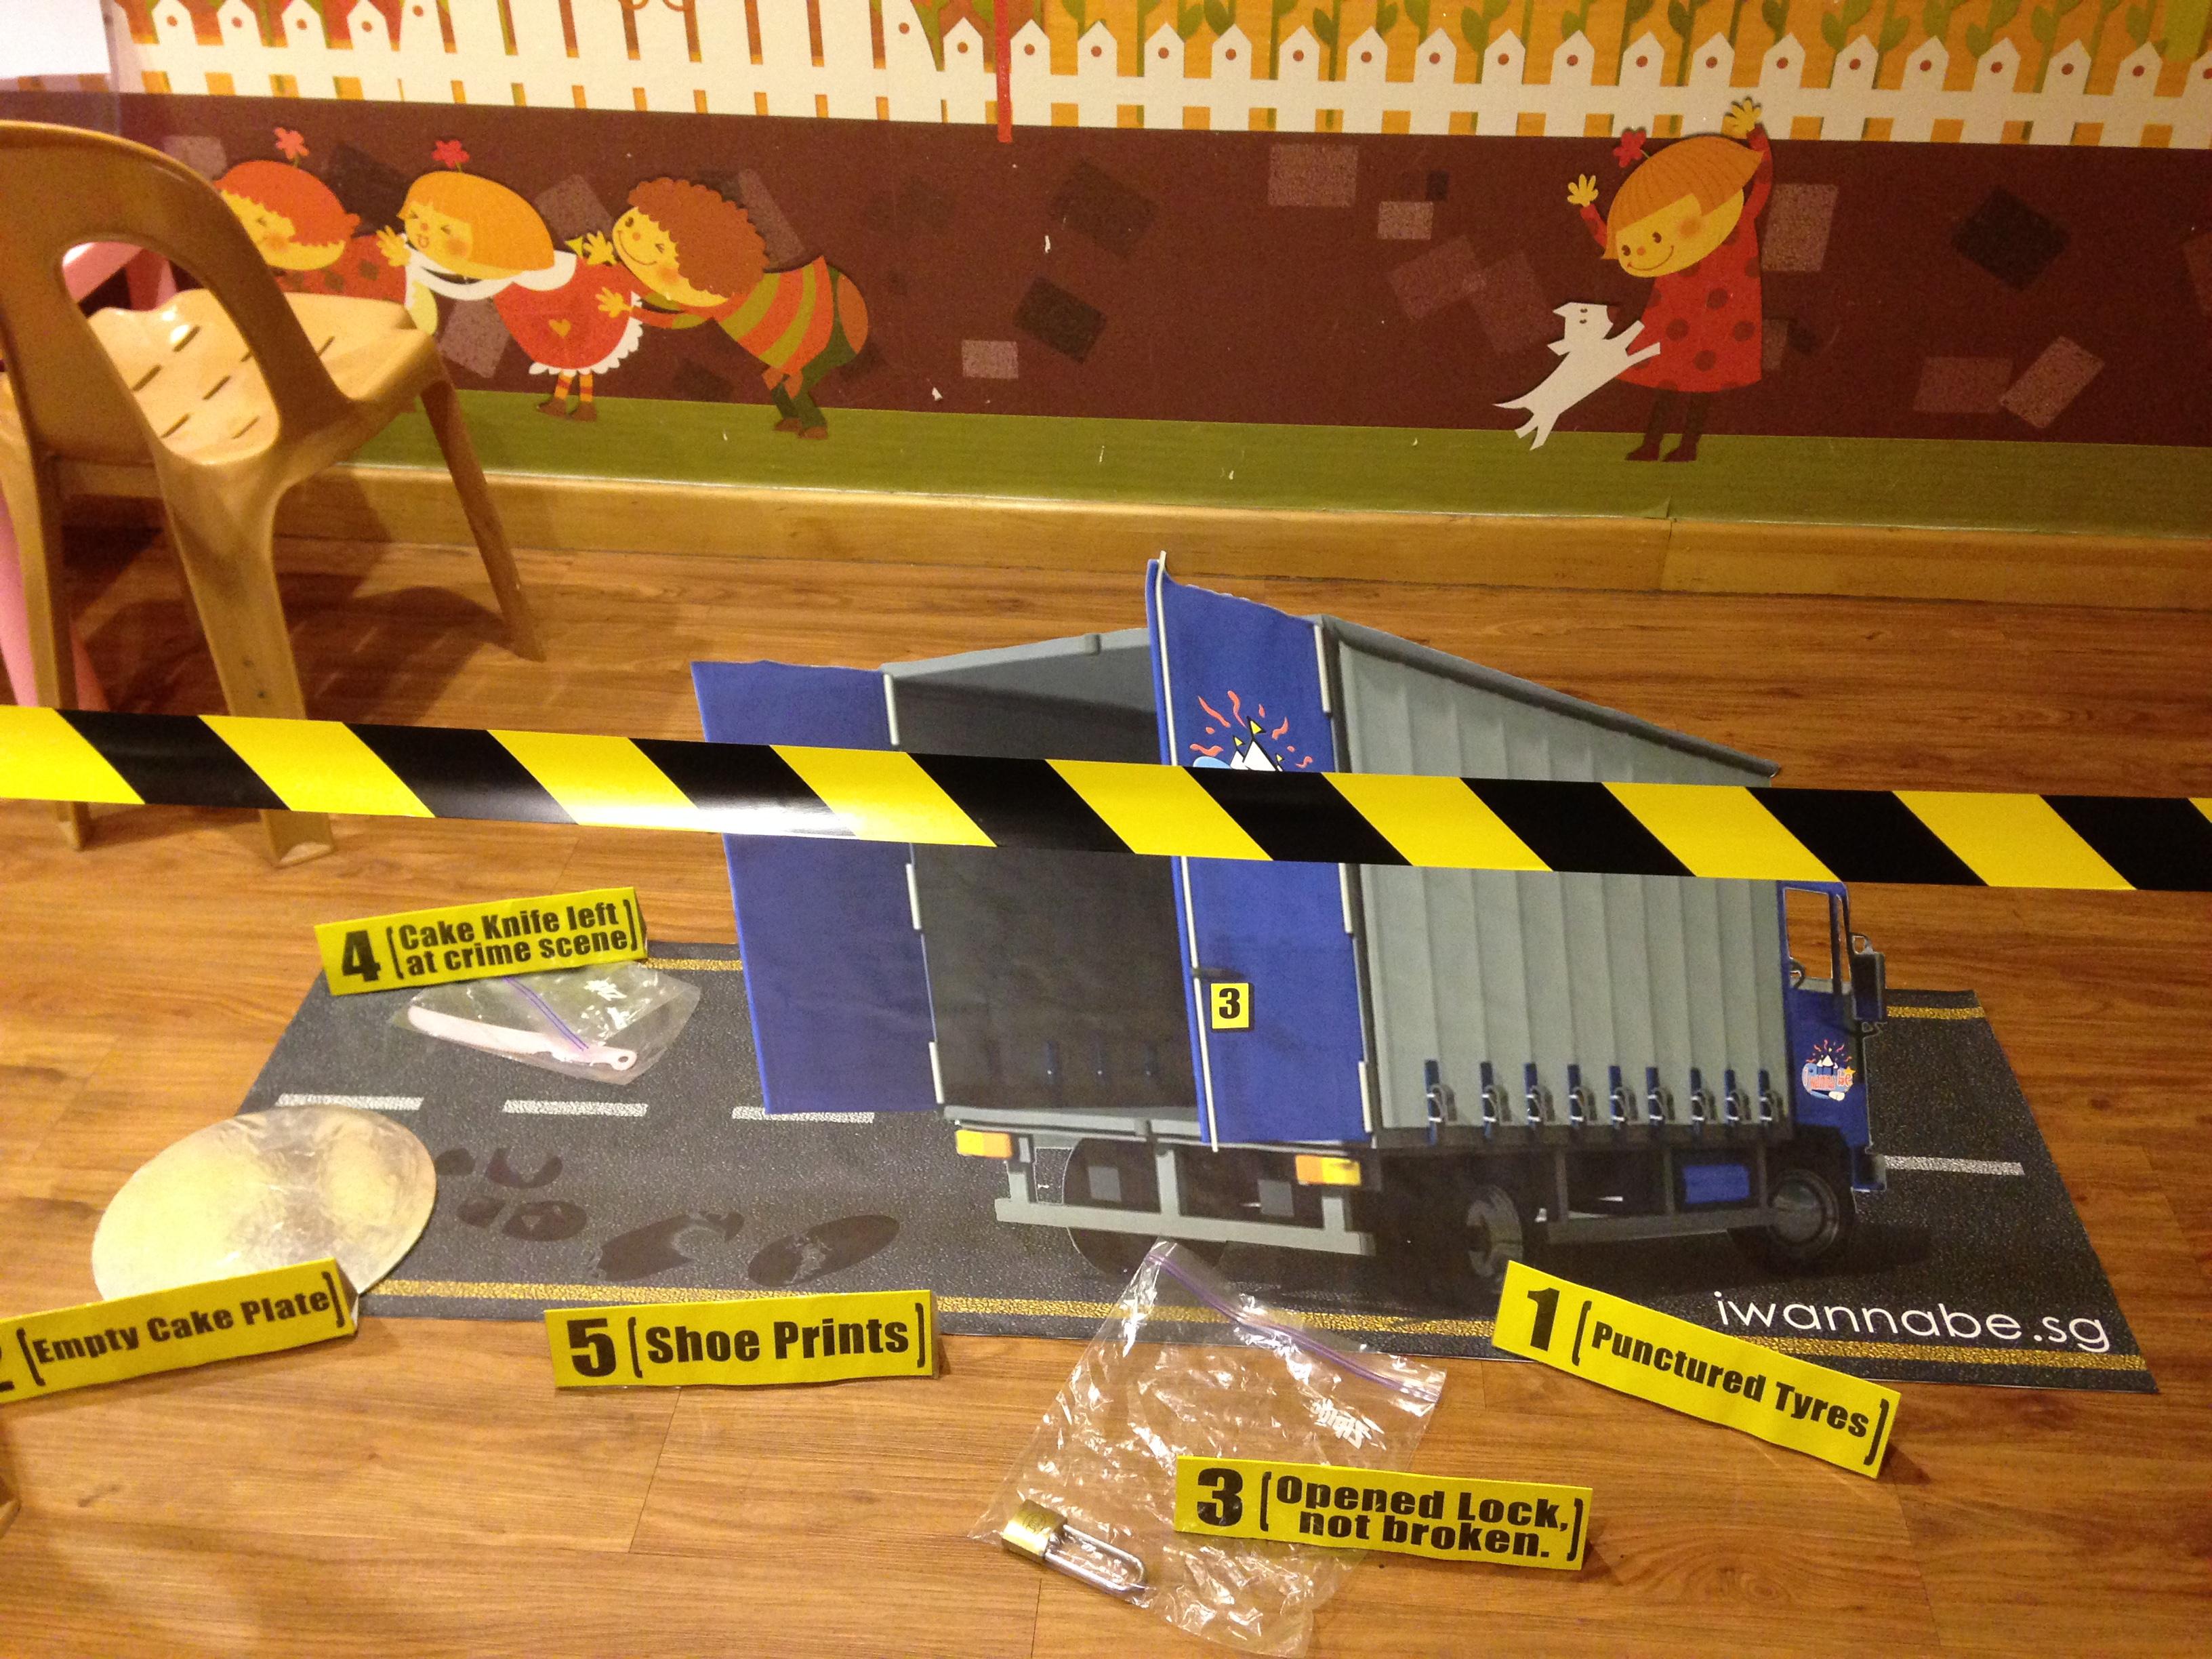 Crime scene set up